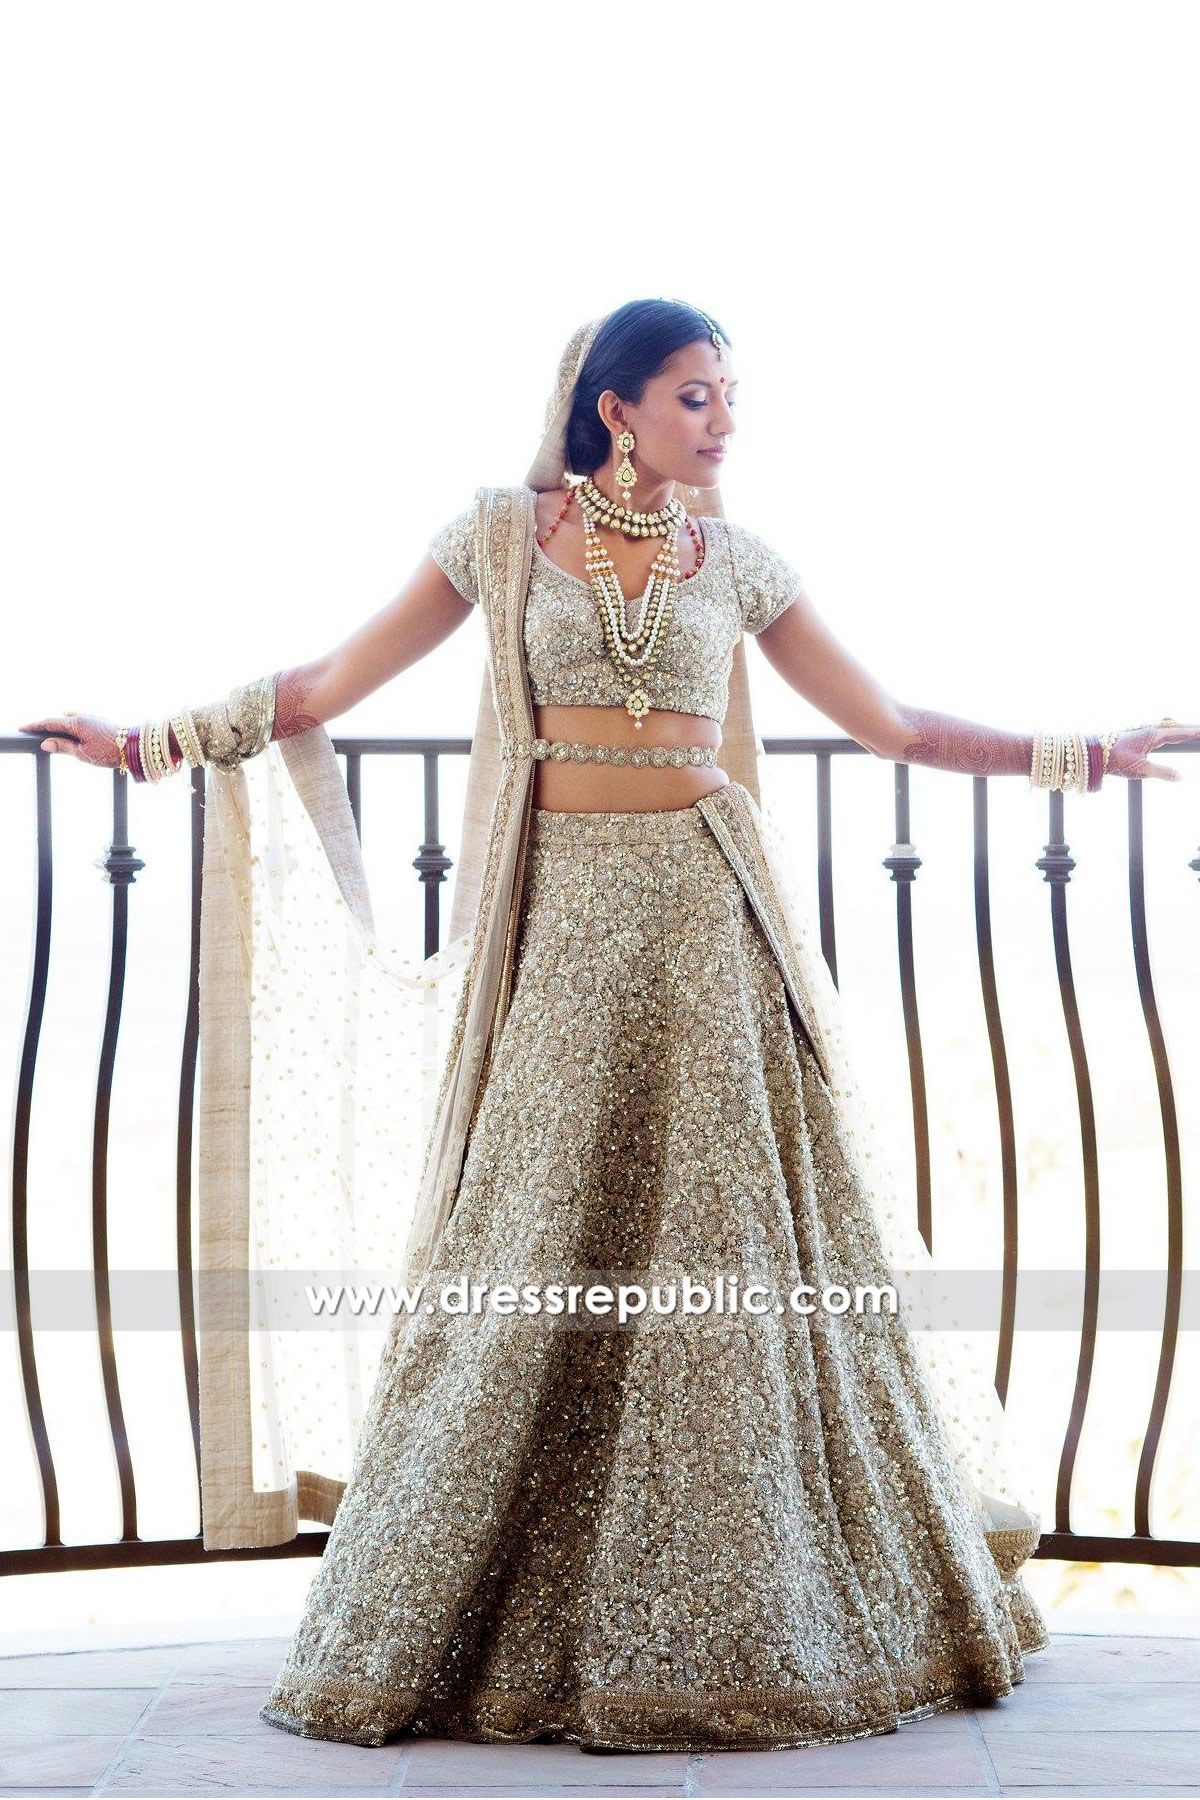 DR14802 Sabyasachi Mukherjee Bridal Lehenga Collection USA, Canada Buy Online